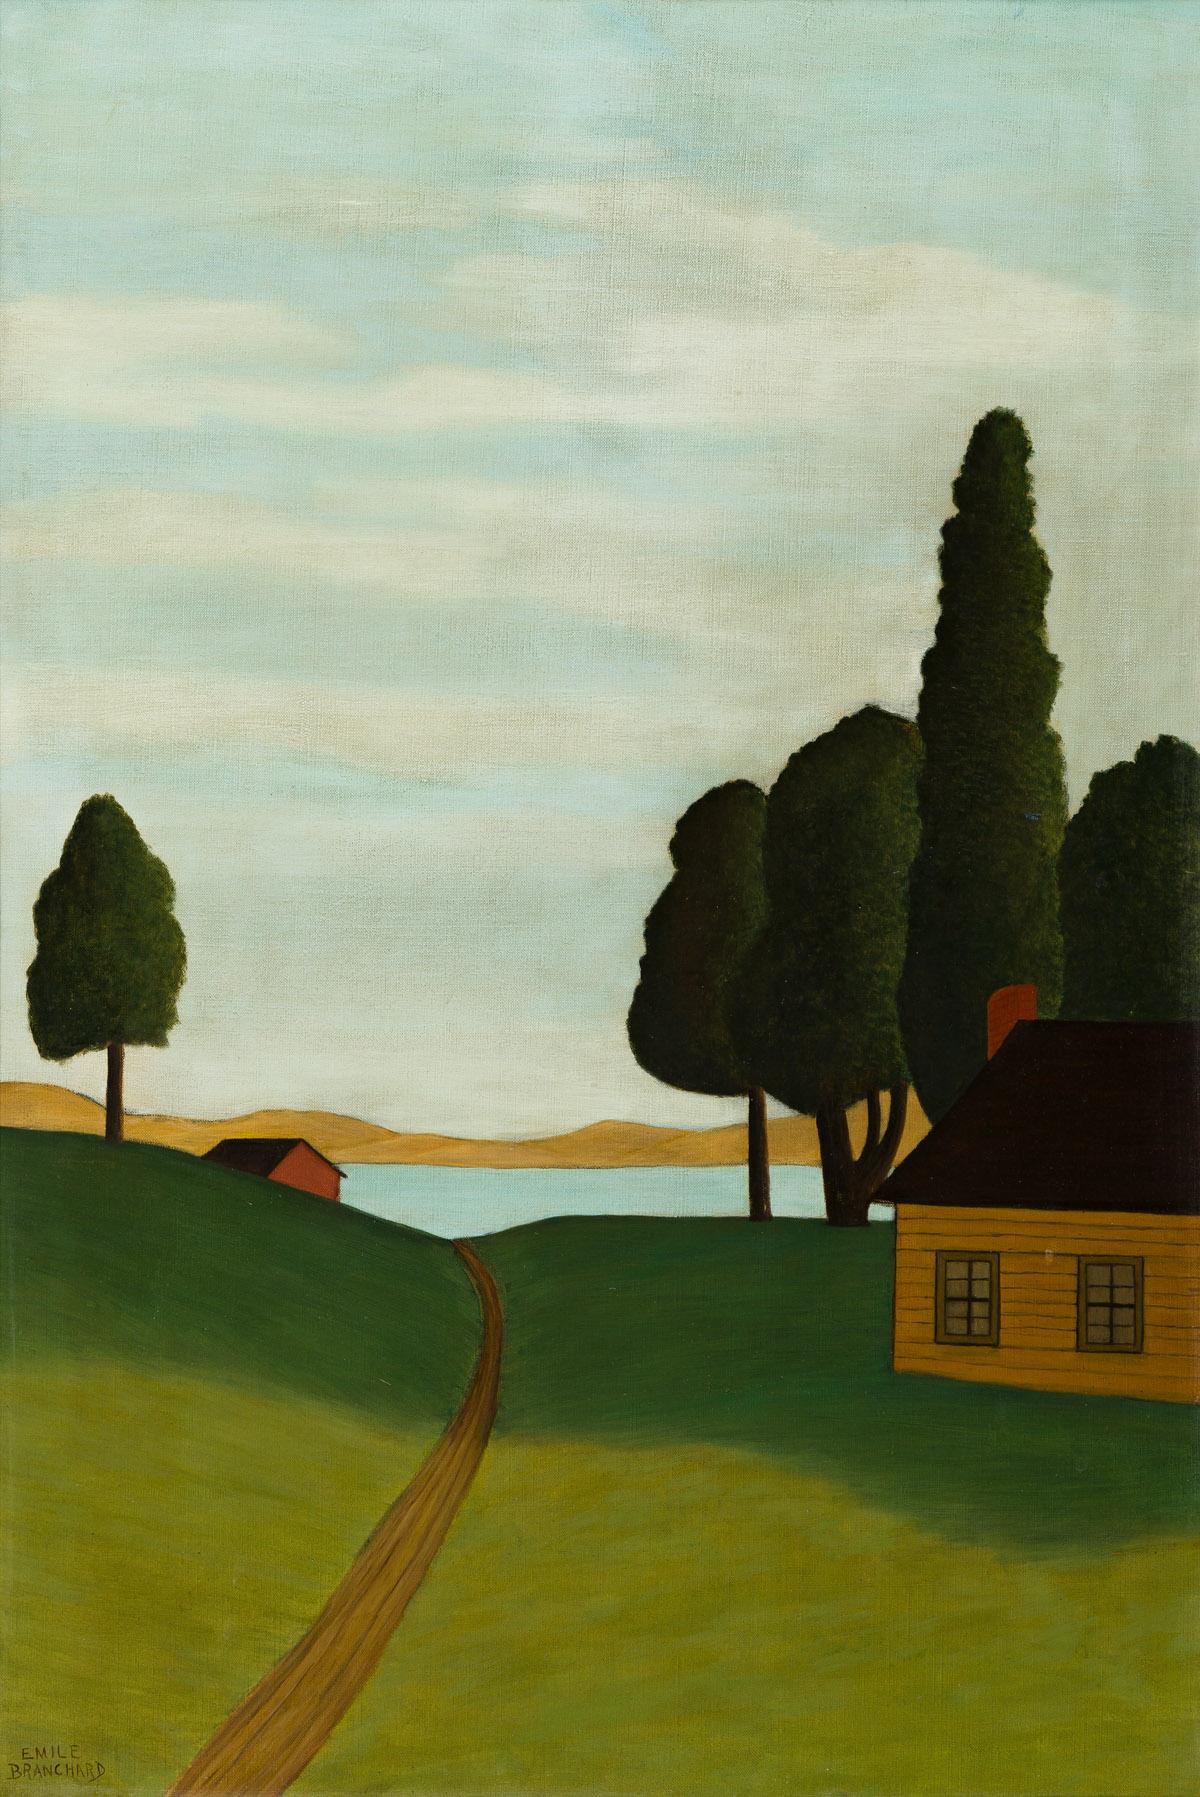 EMILE BRANCHARD (1881-1938) At the Lake.